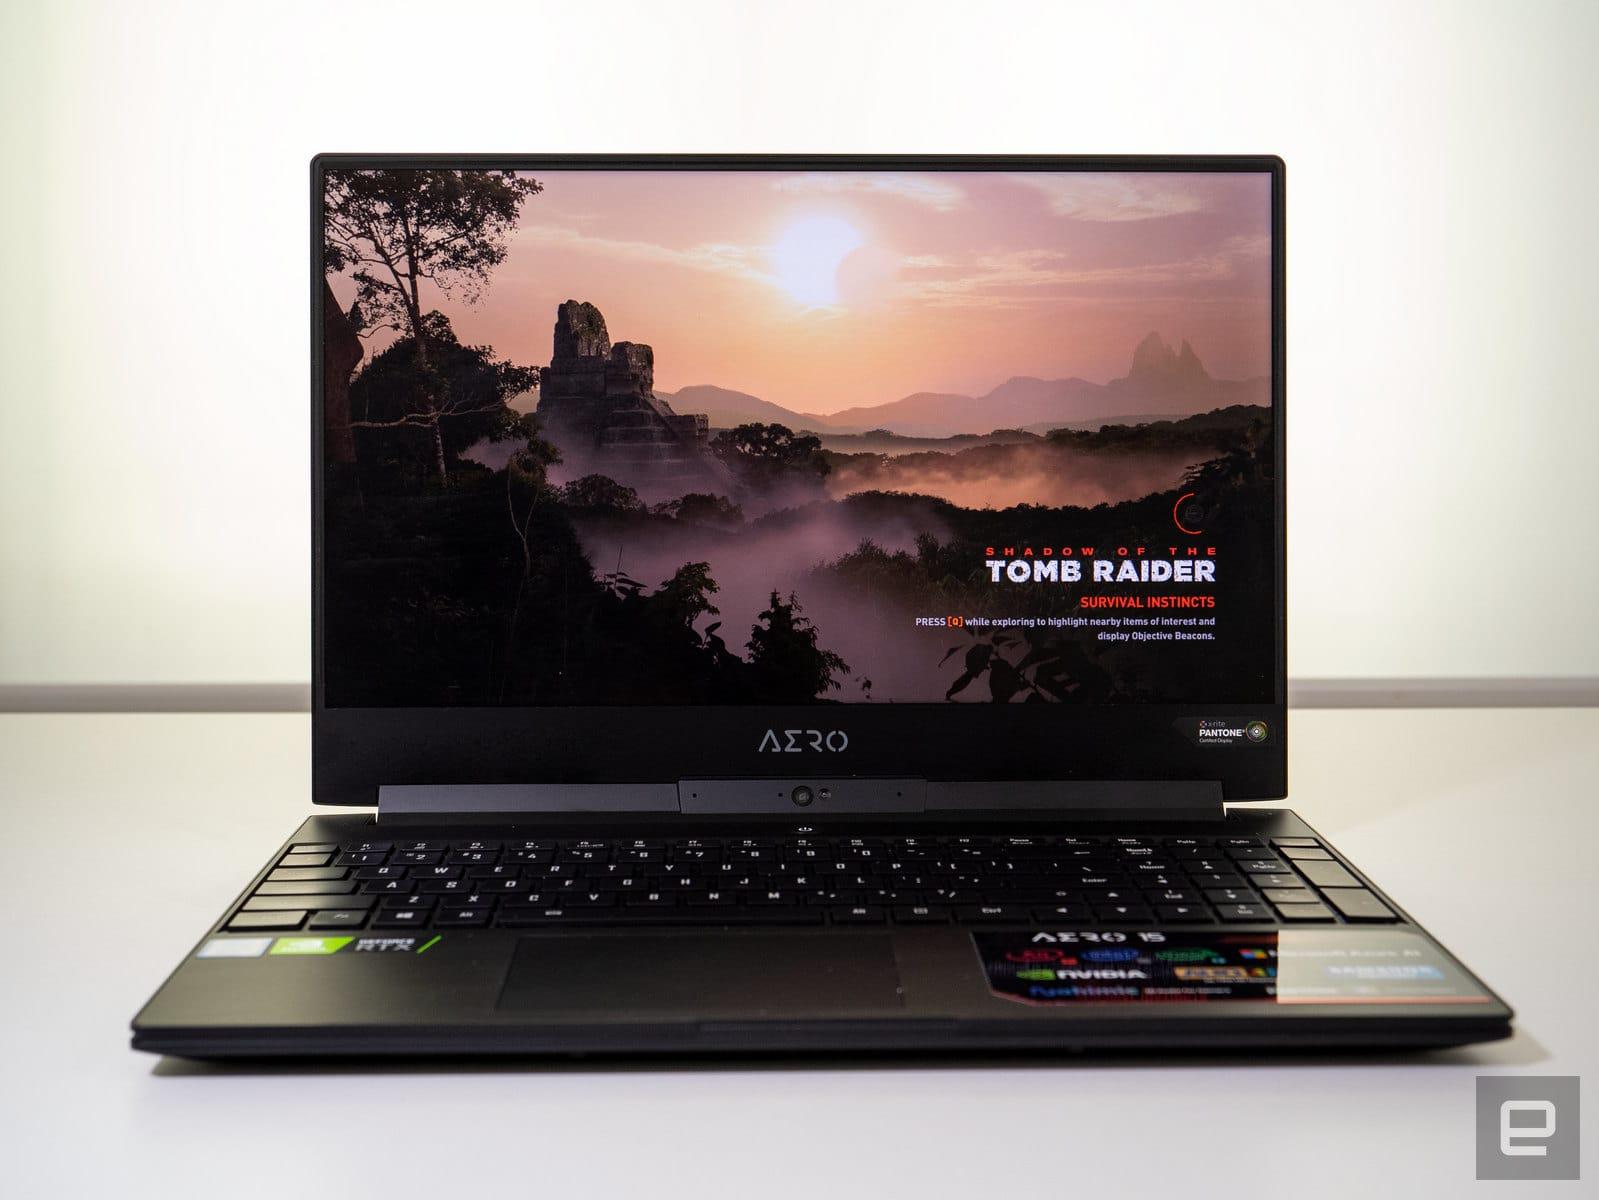 Gigabyte Aero 15 Y9 gaming laptop with NVIDIA RTX 2080 Max-Q graphics